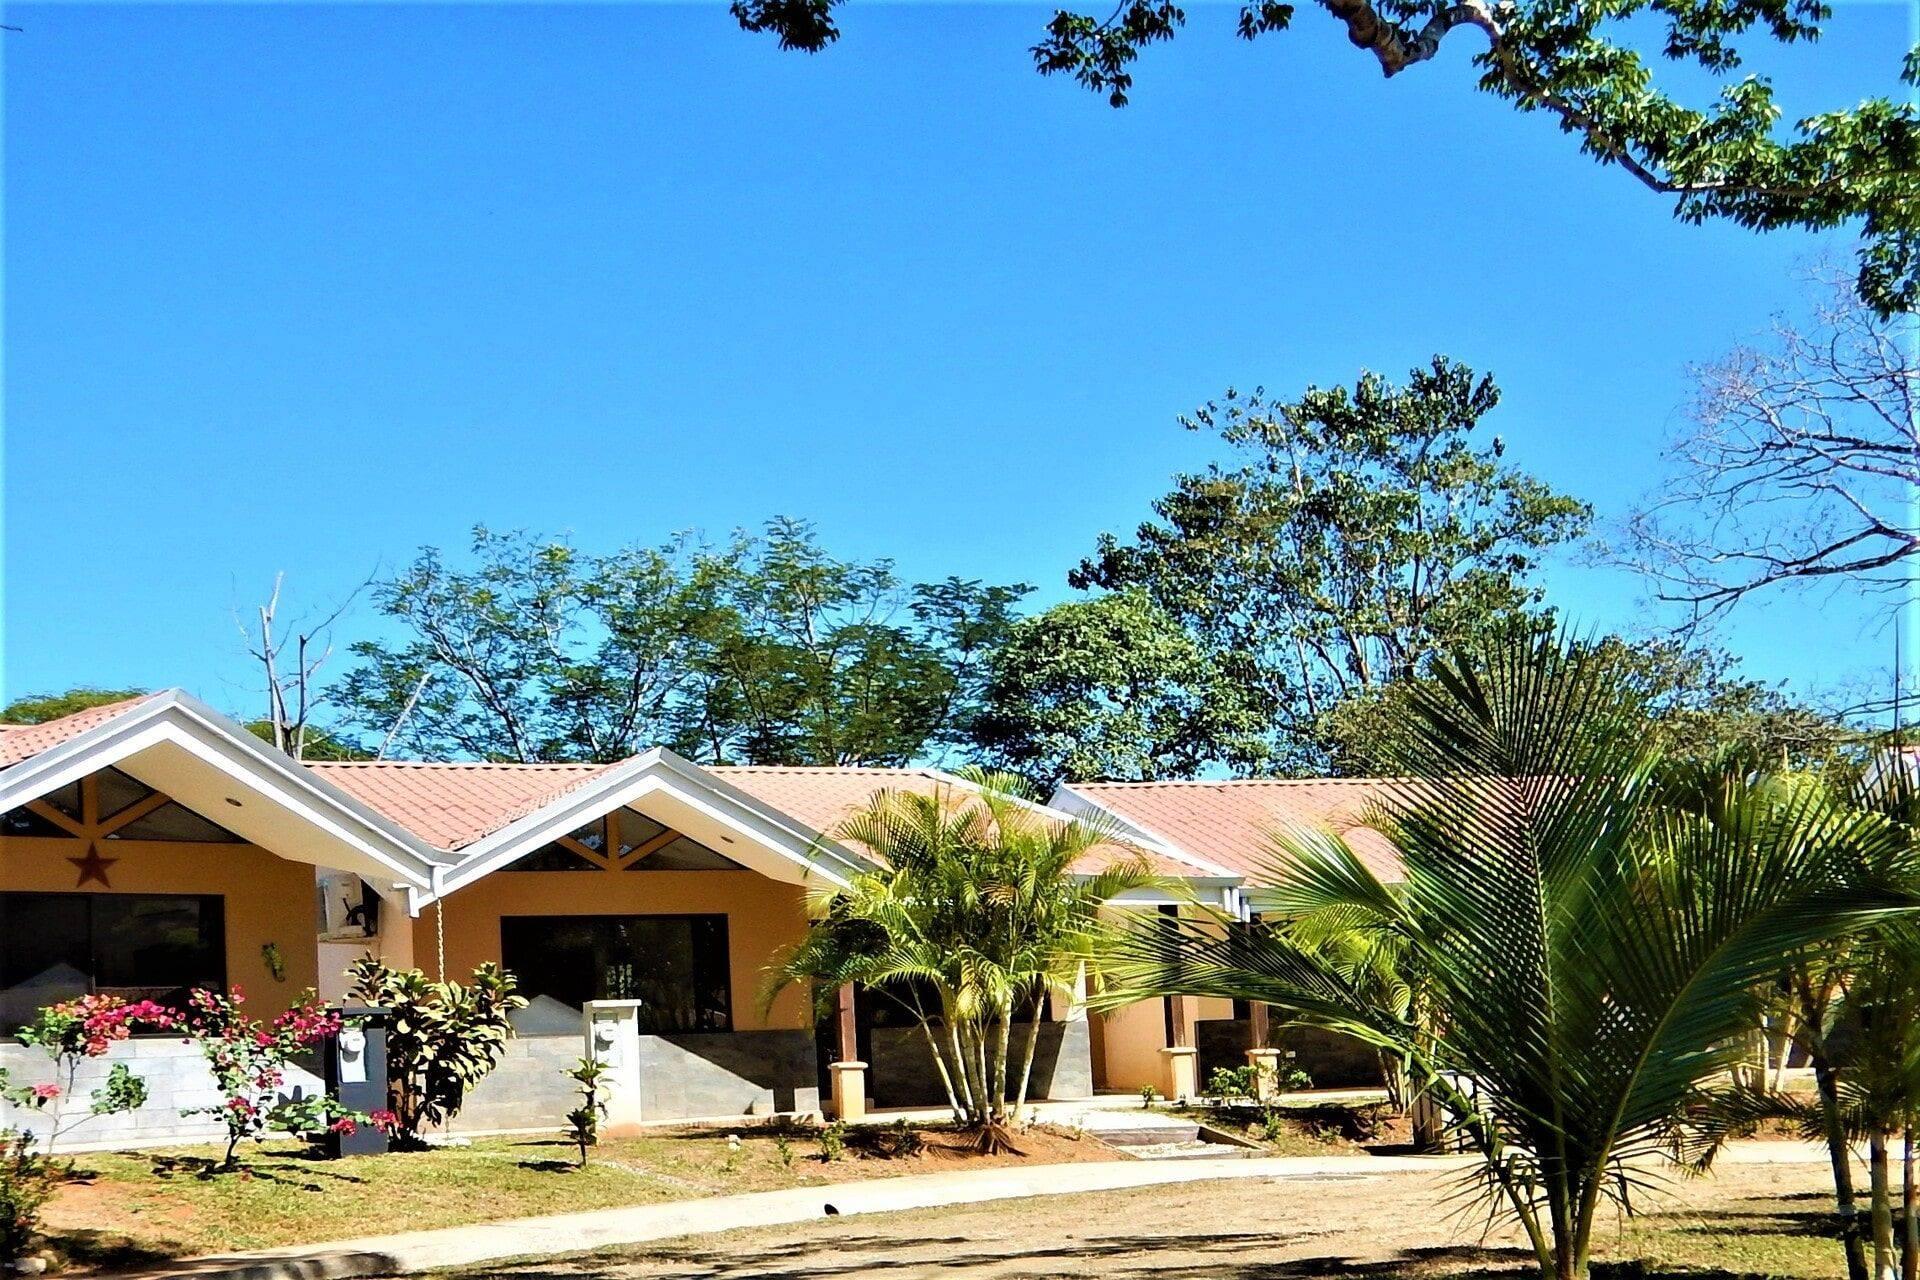 Villa Tropical in Playa Lagarto Eco Development